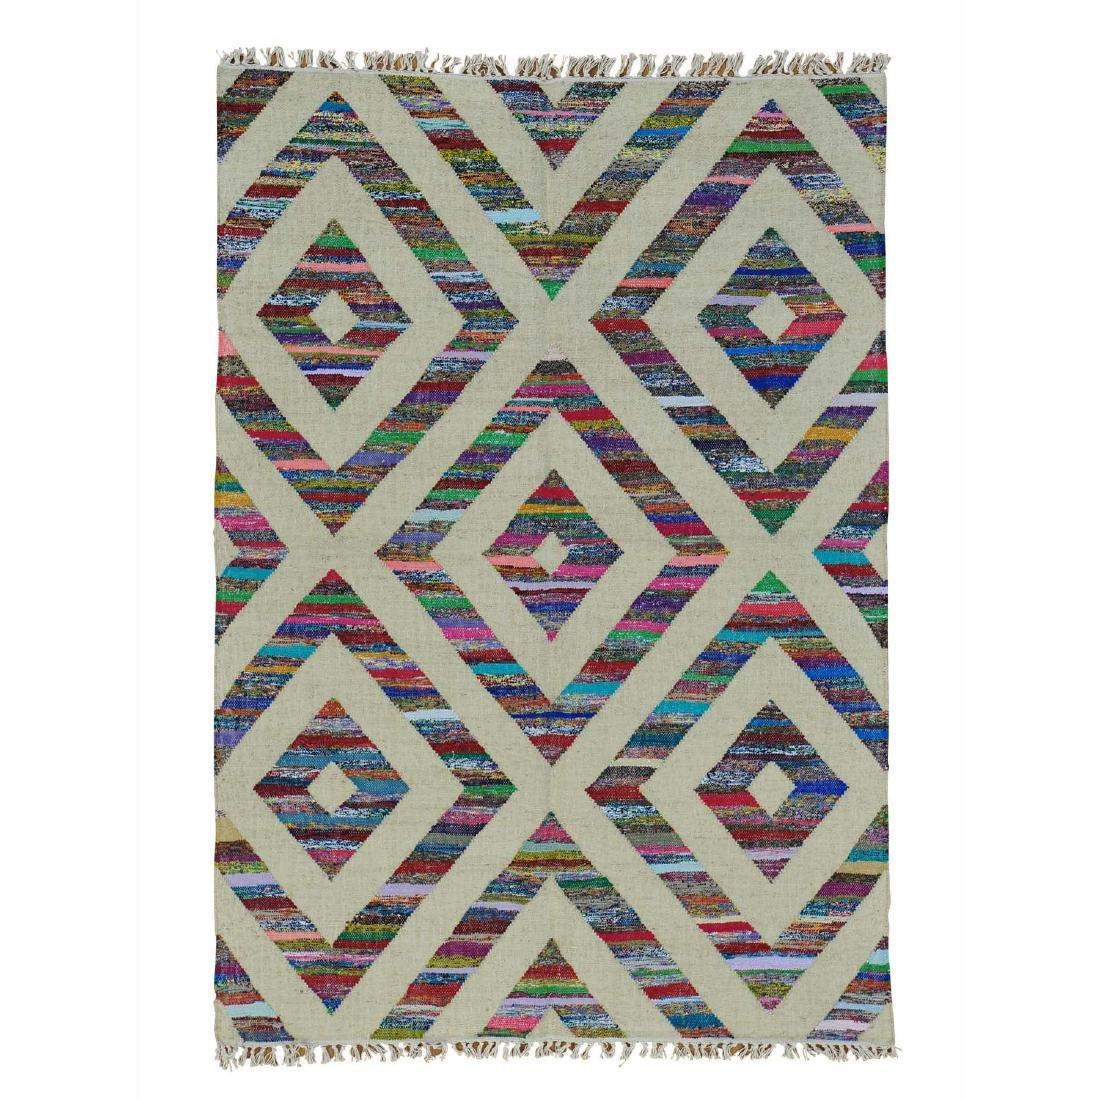 Durie Kilim Wool & Sari Silk Flat Weave Rug 5x7.2